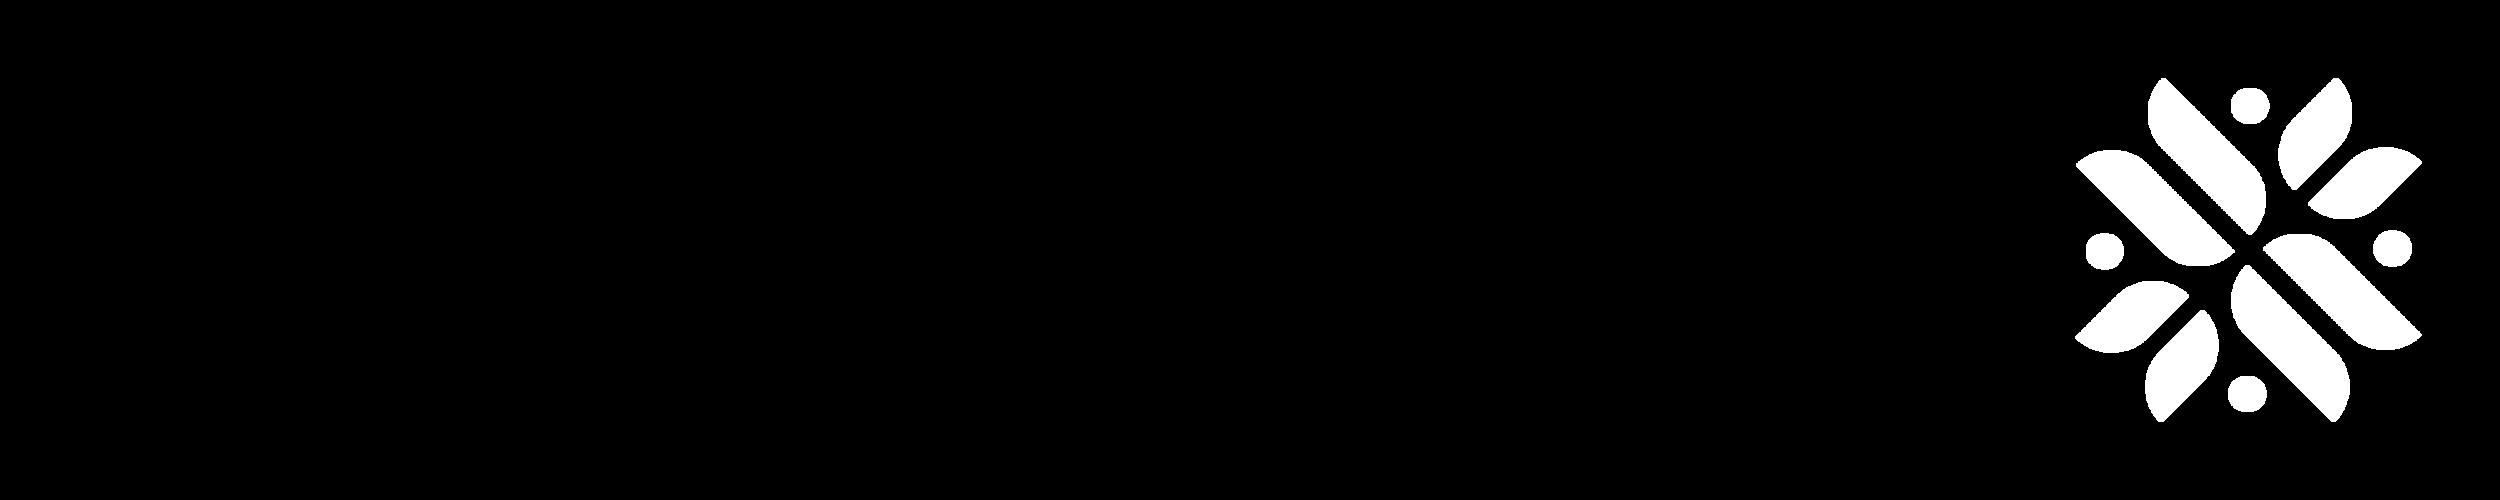 FFAF-logo-white-right.png